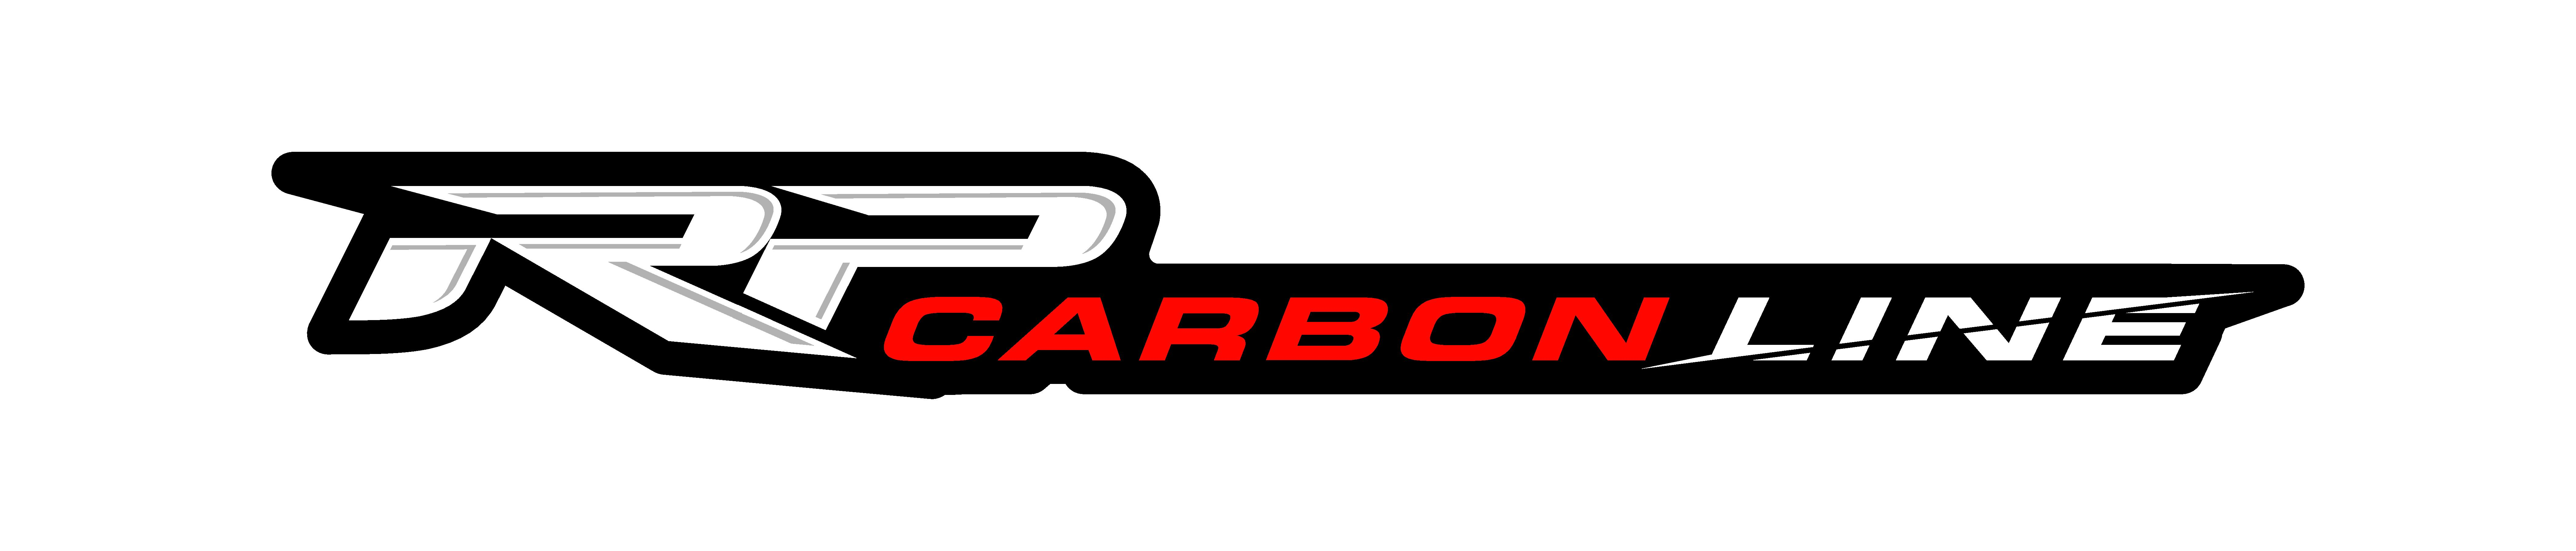 RP Carbonline